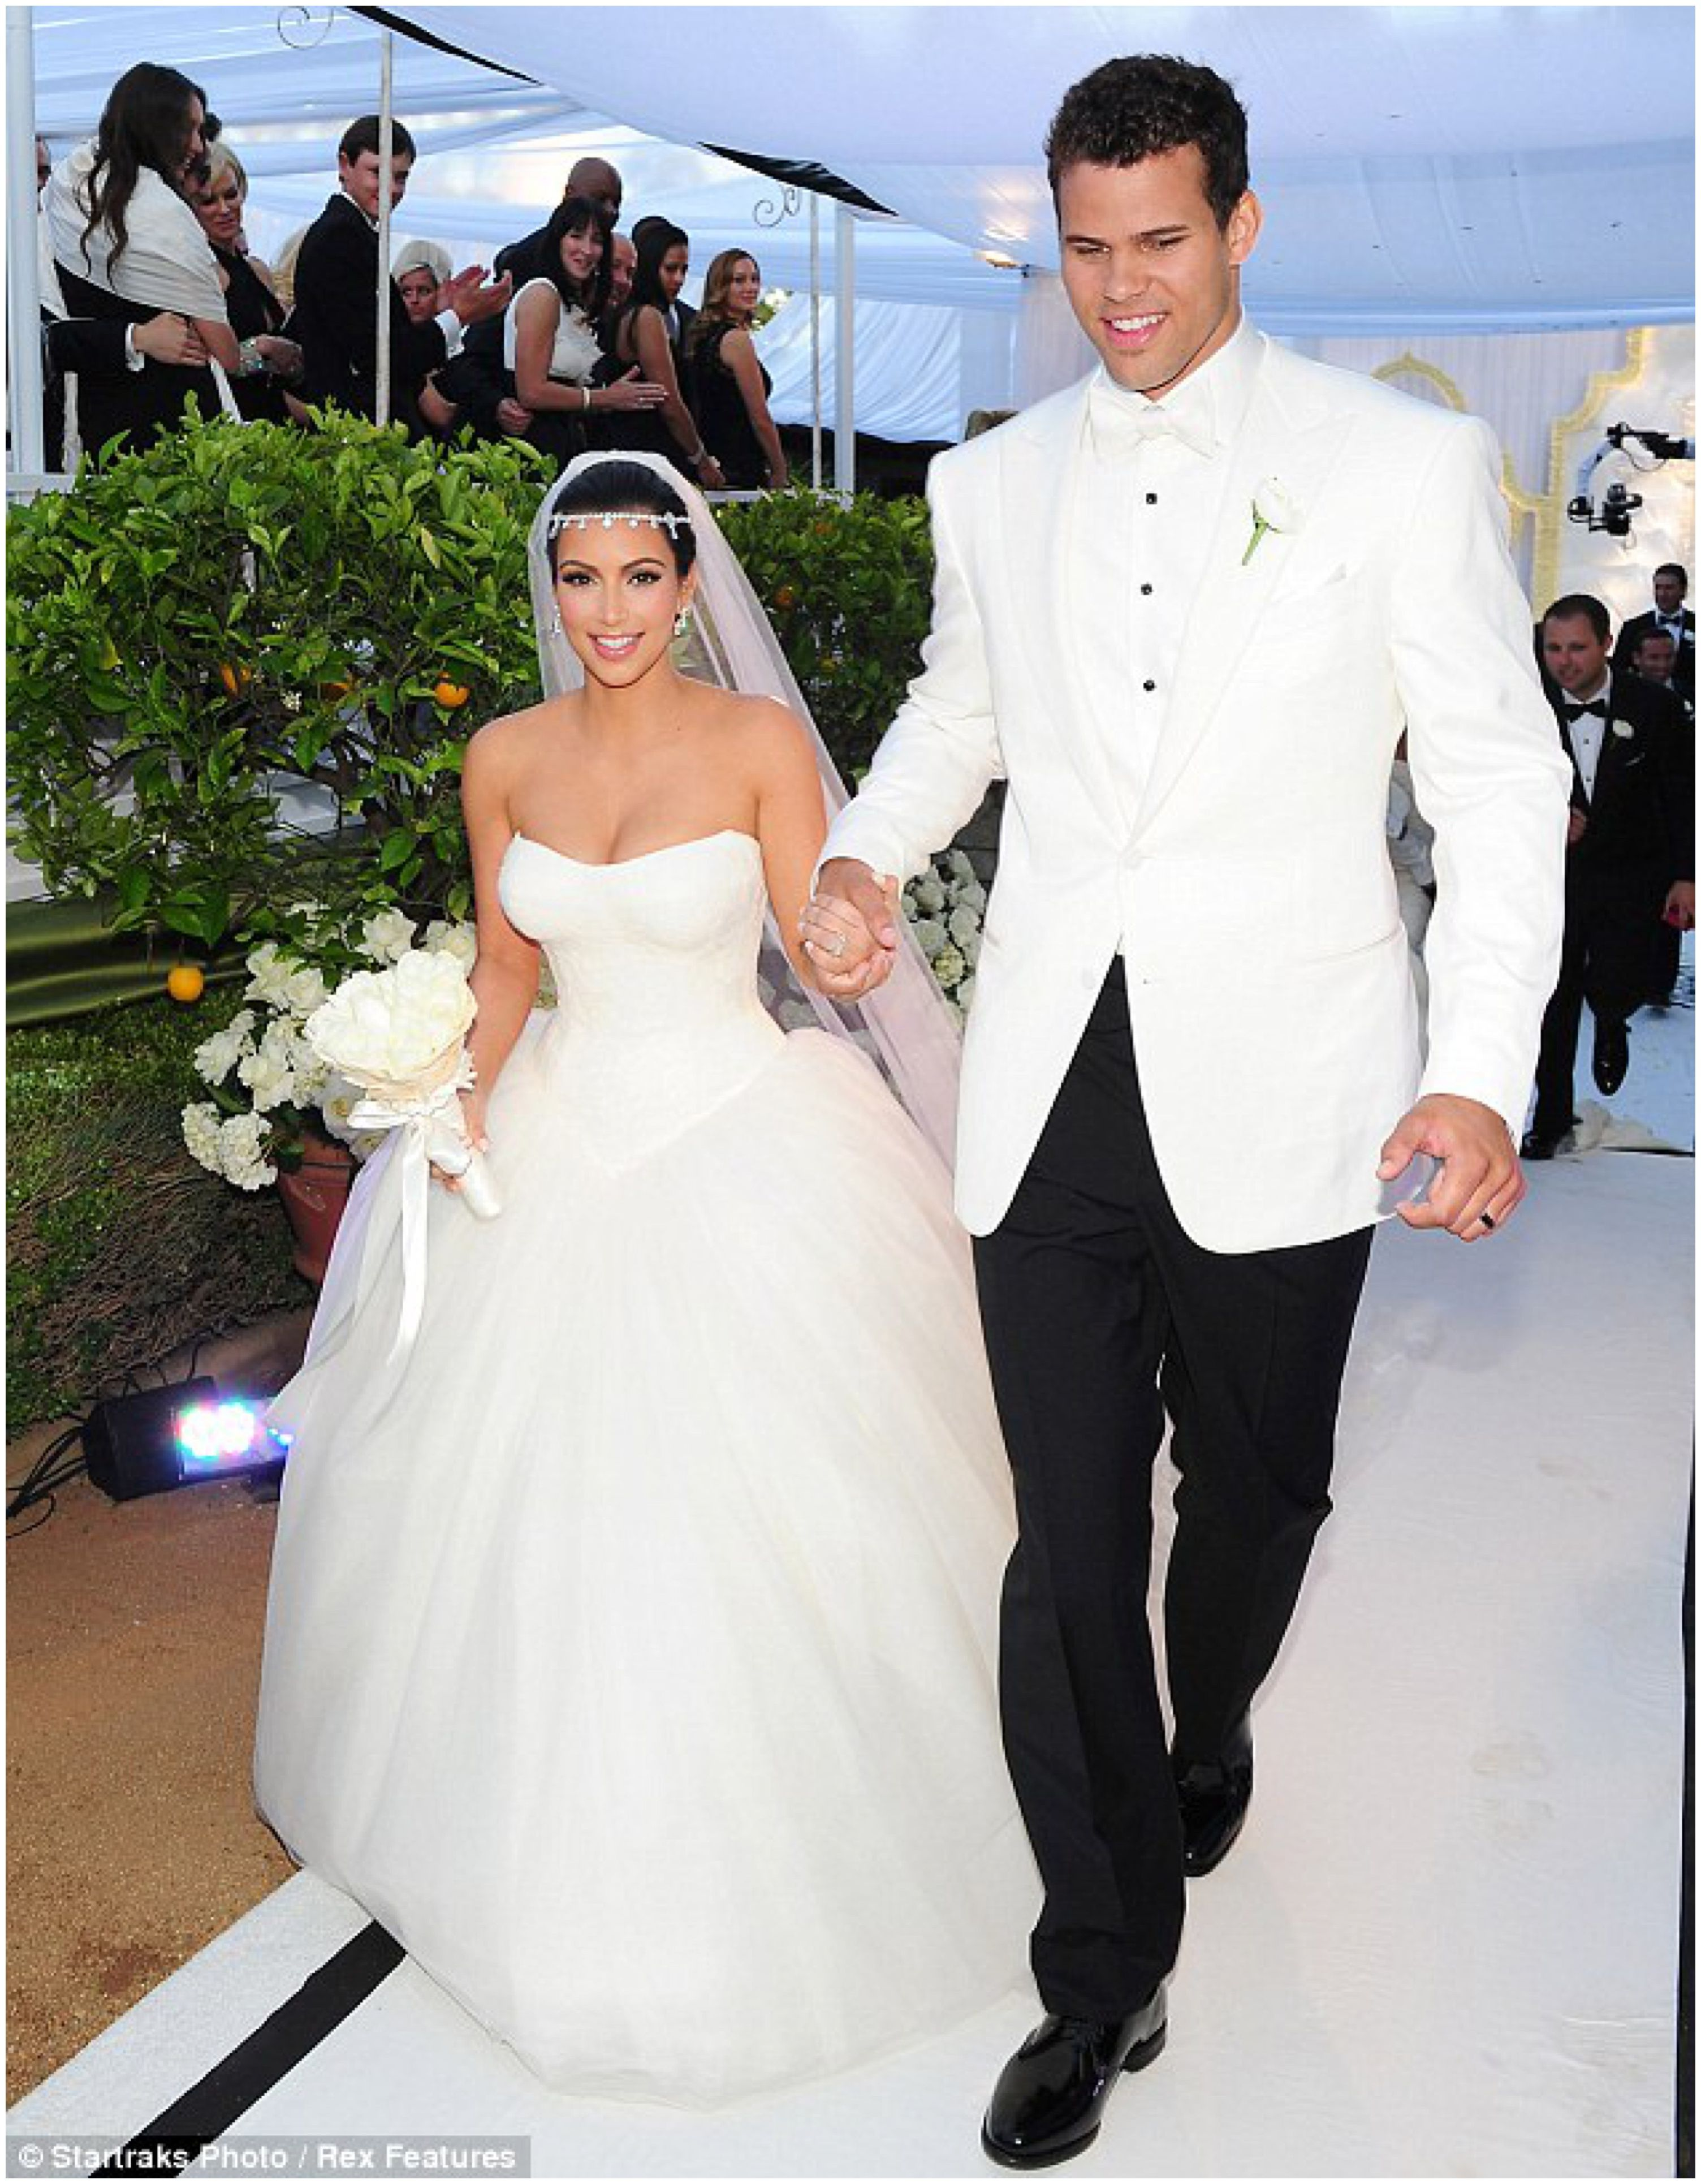 Wedding News Kim Kardashian S Wedding Dresses Kim Kardashian And Kris Humphries Wedding Kim Kardashian Wedding Dress Kim Kardashian Wedding Kardashian Wedding